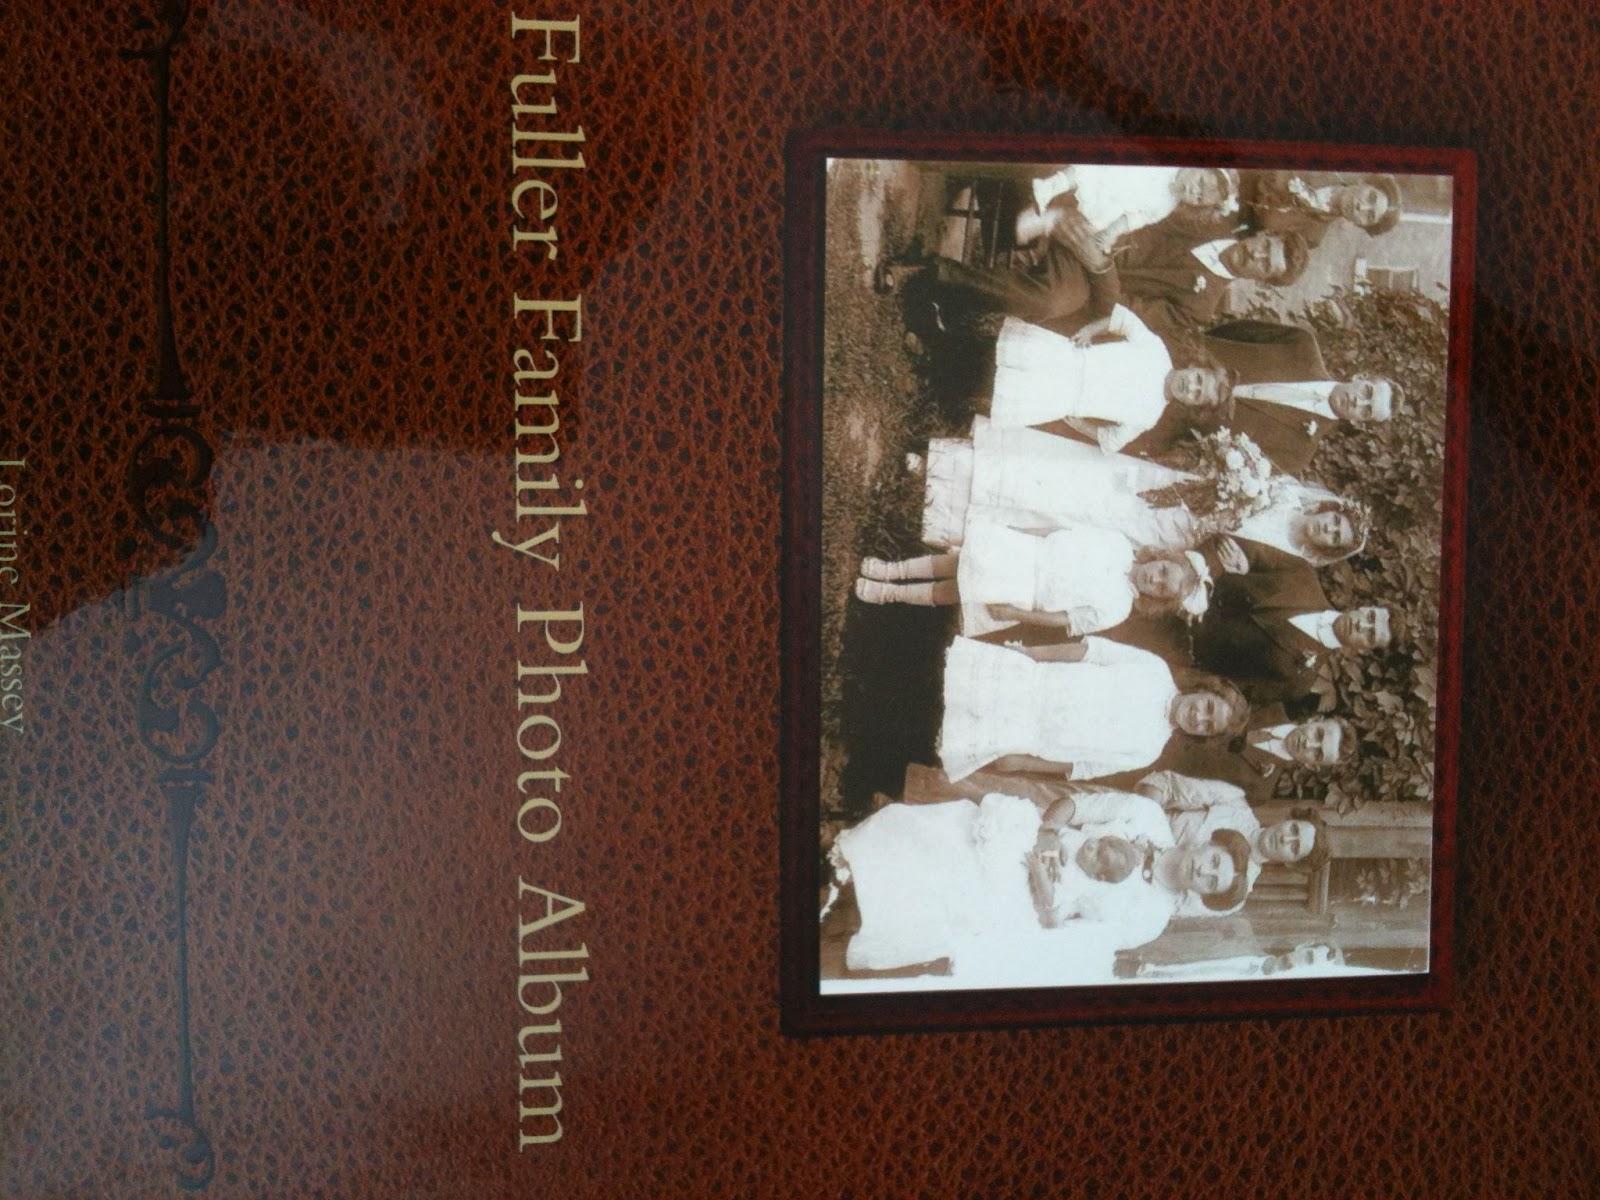 Lulu Book Cover Template : Olive tree genealogy publishing a photo book on lulu